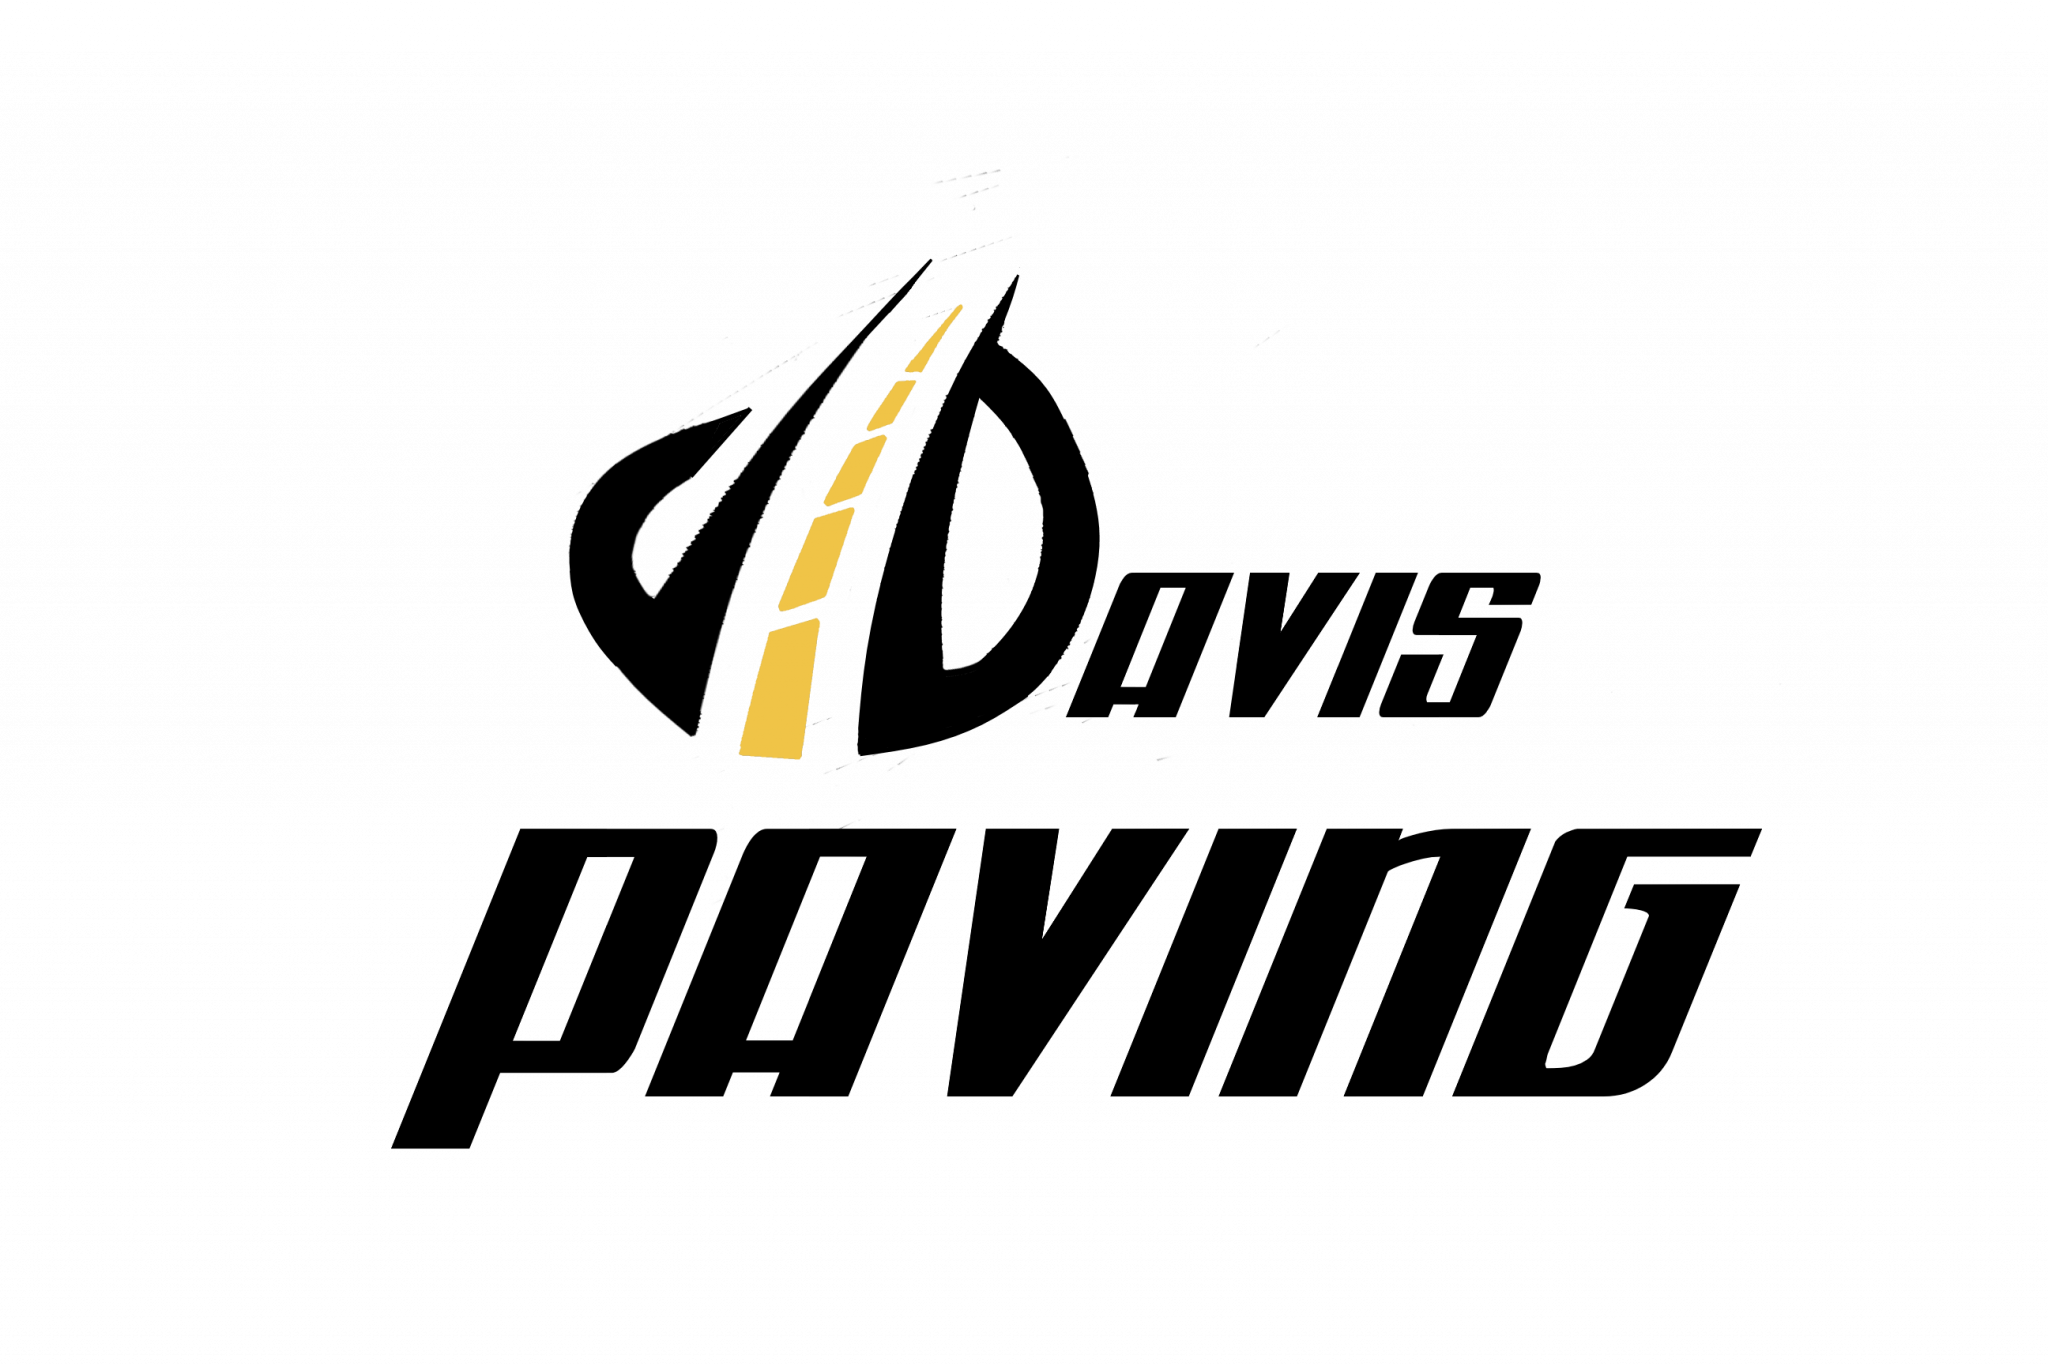 logo-j-davis-2021 1C - Copy - Copy - Copy